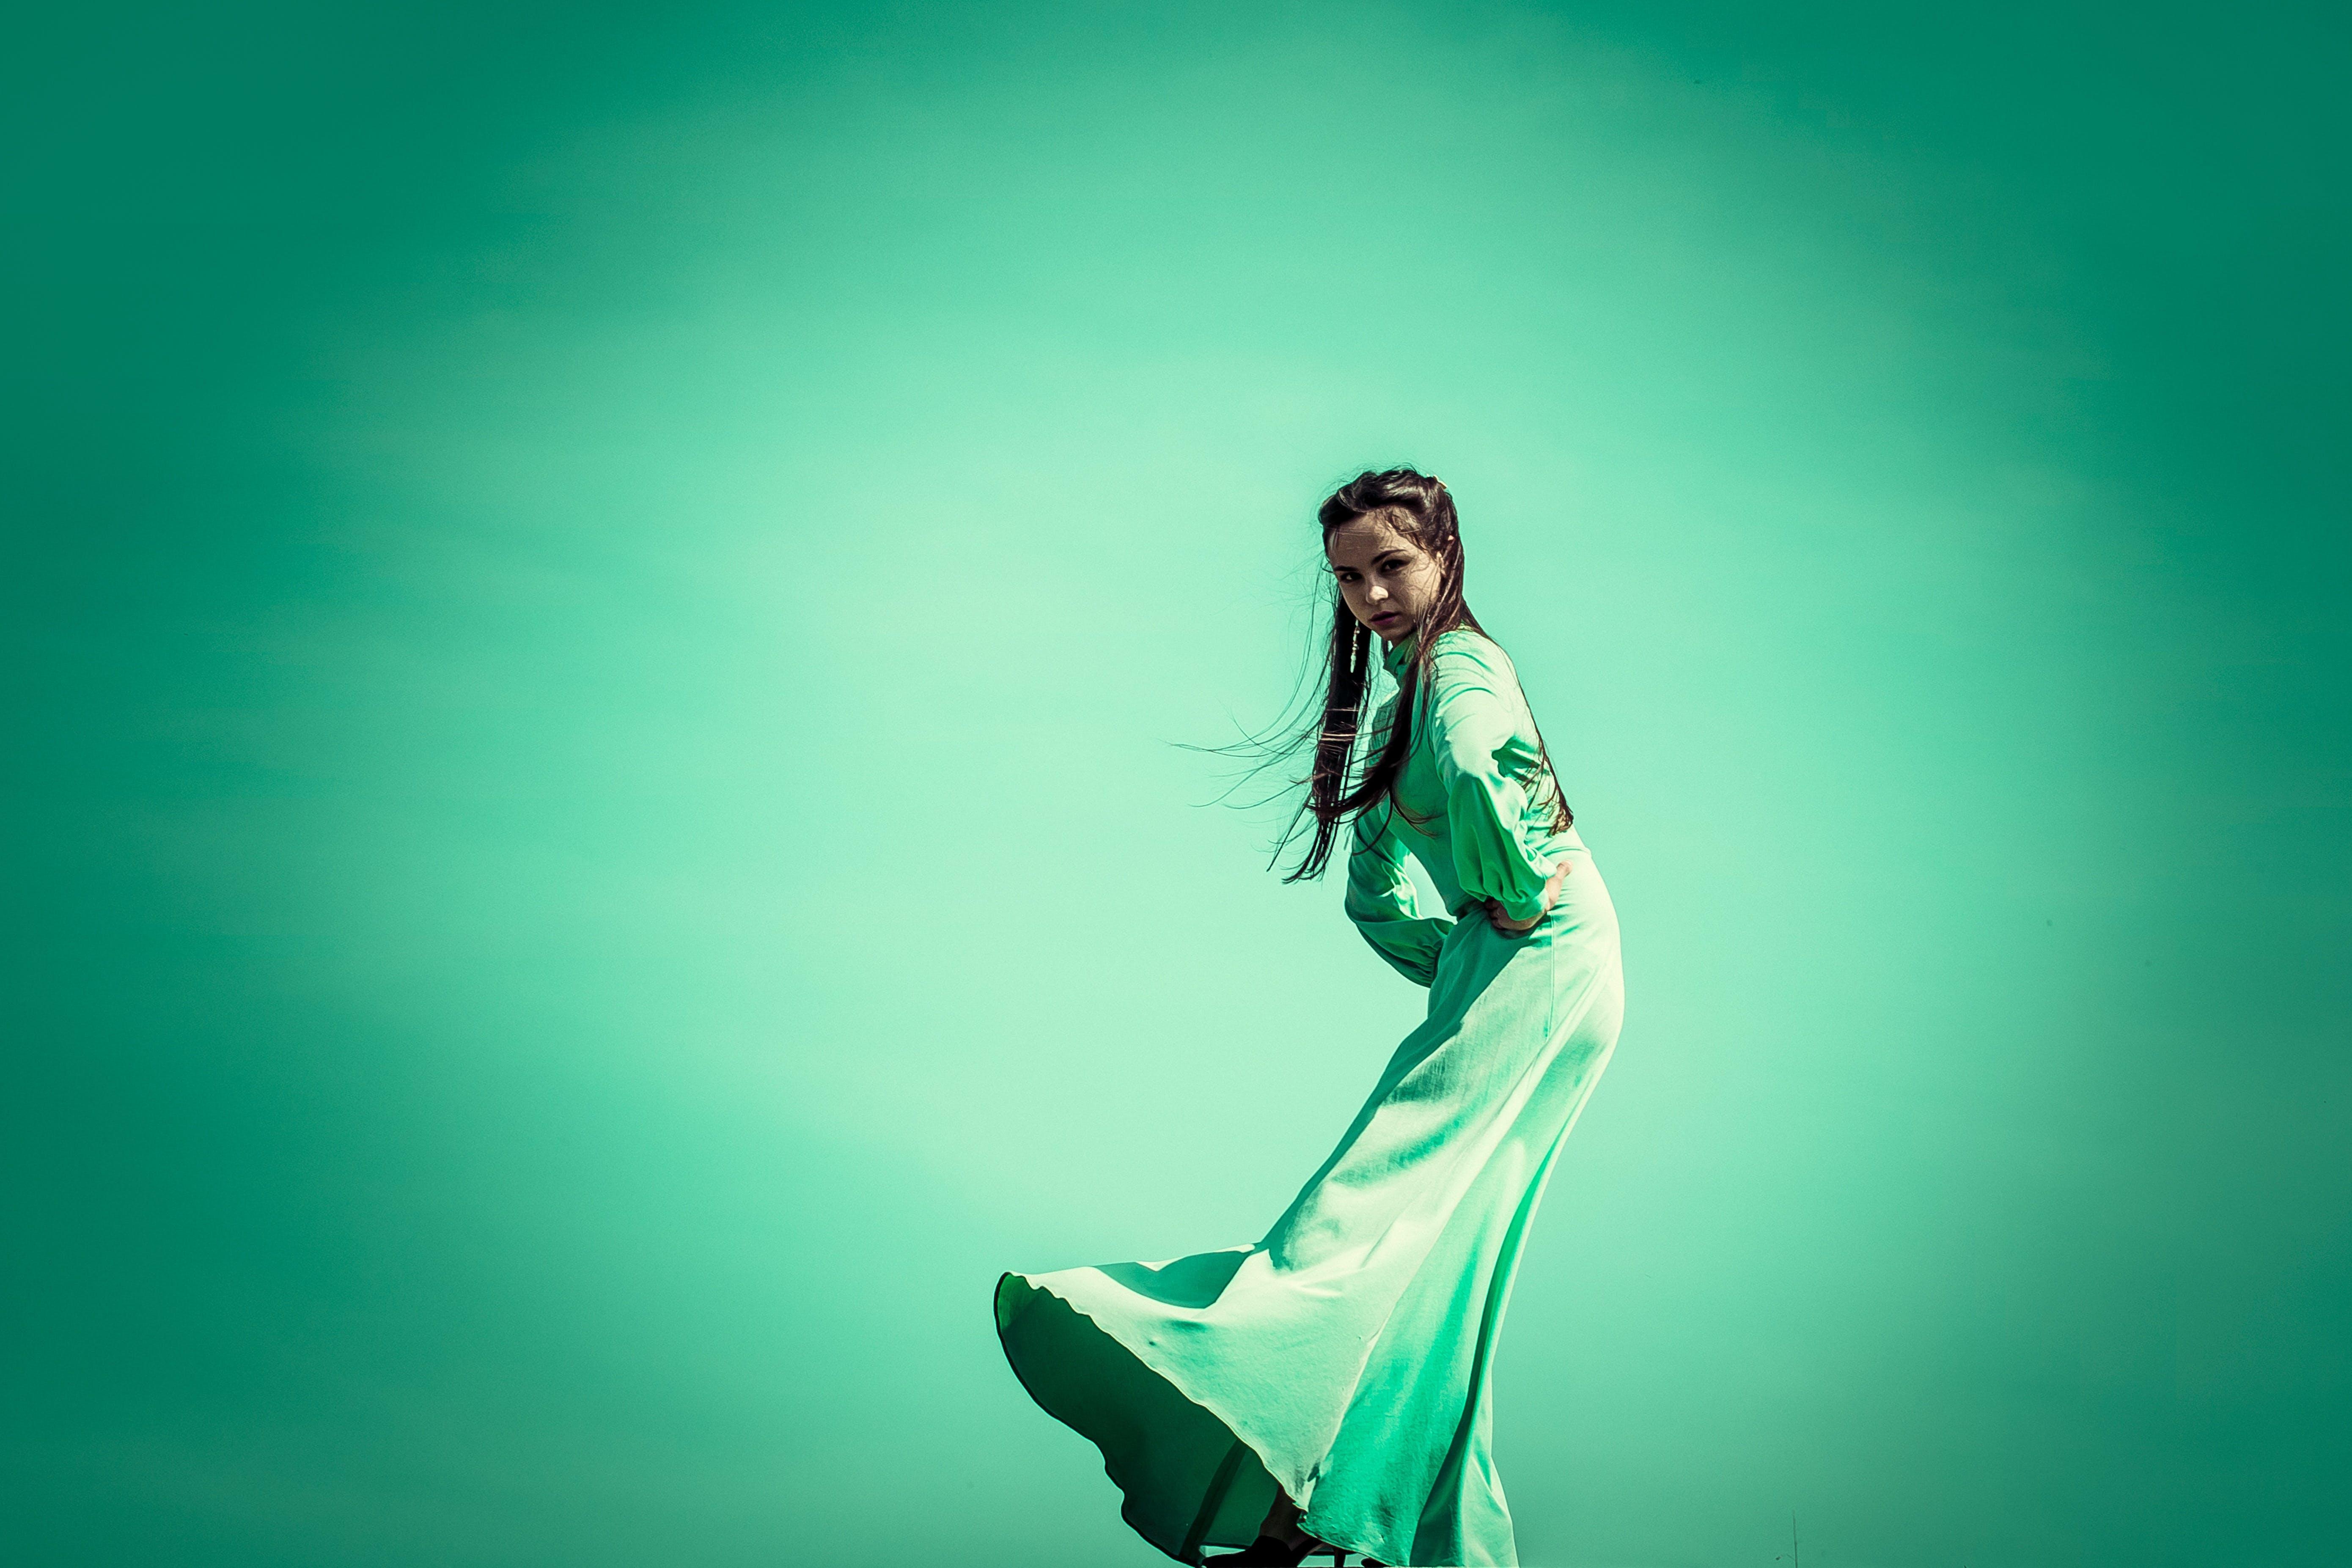 Woman in Green Maxi Dress